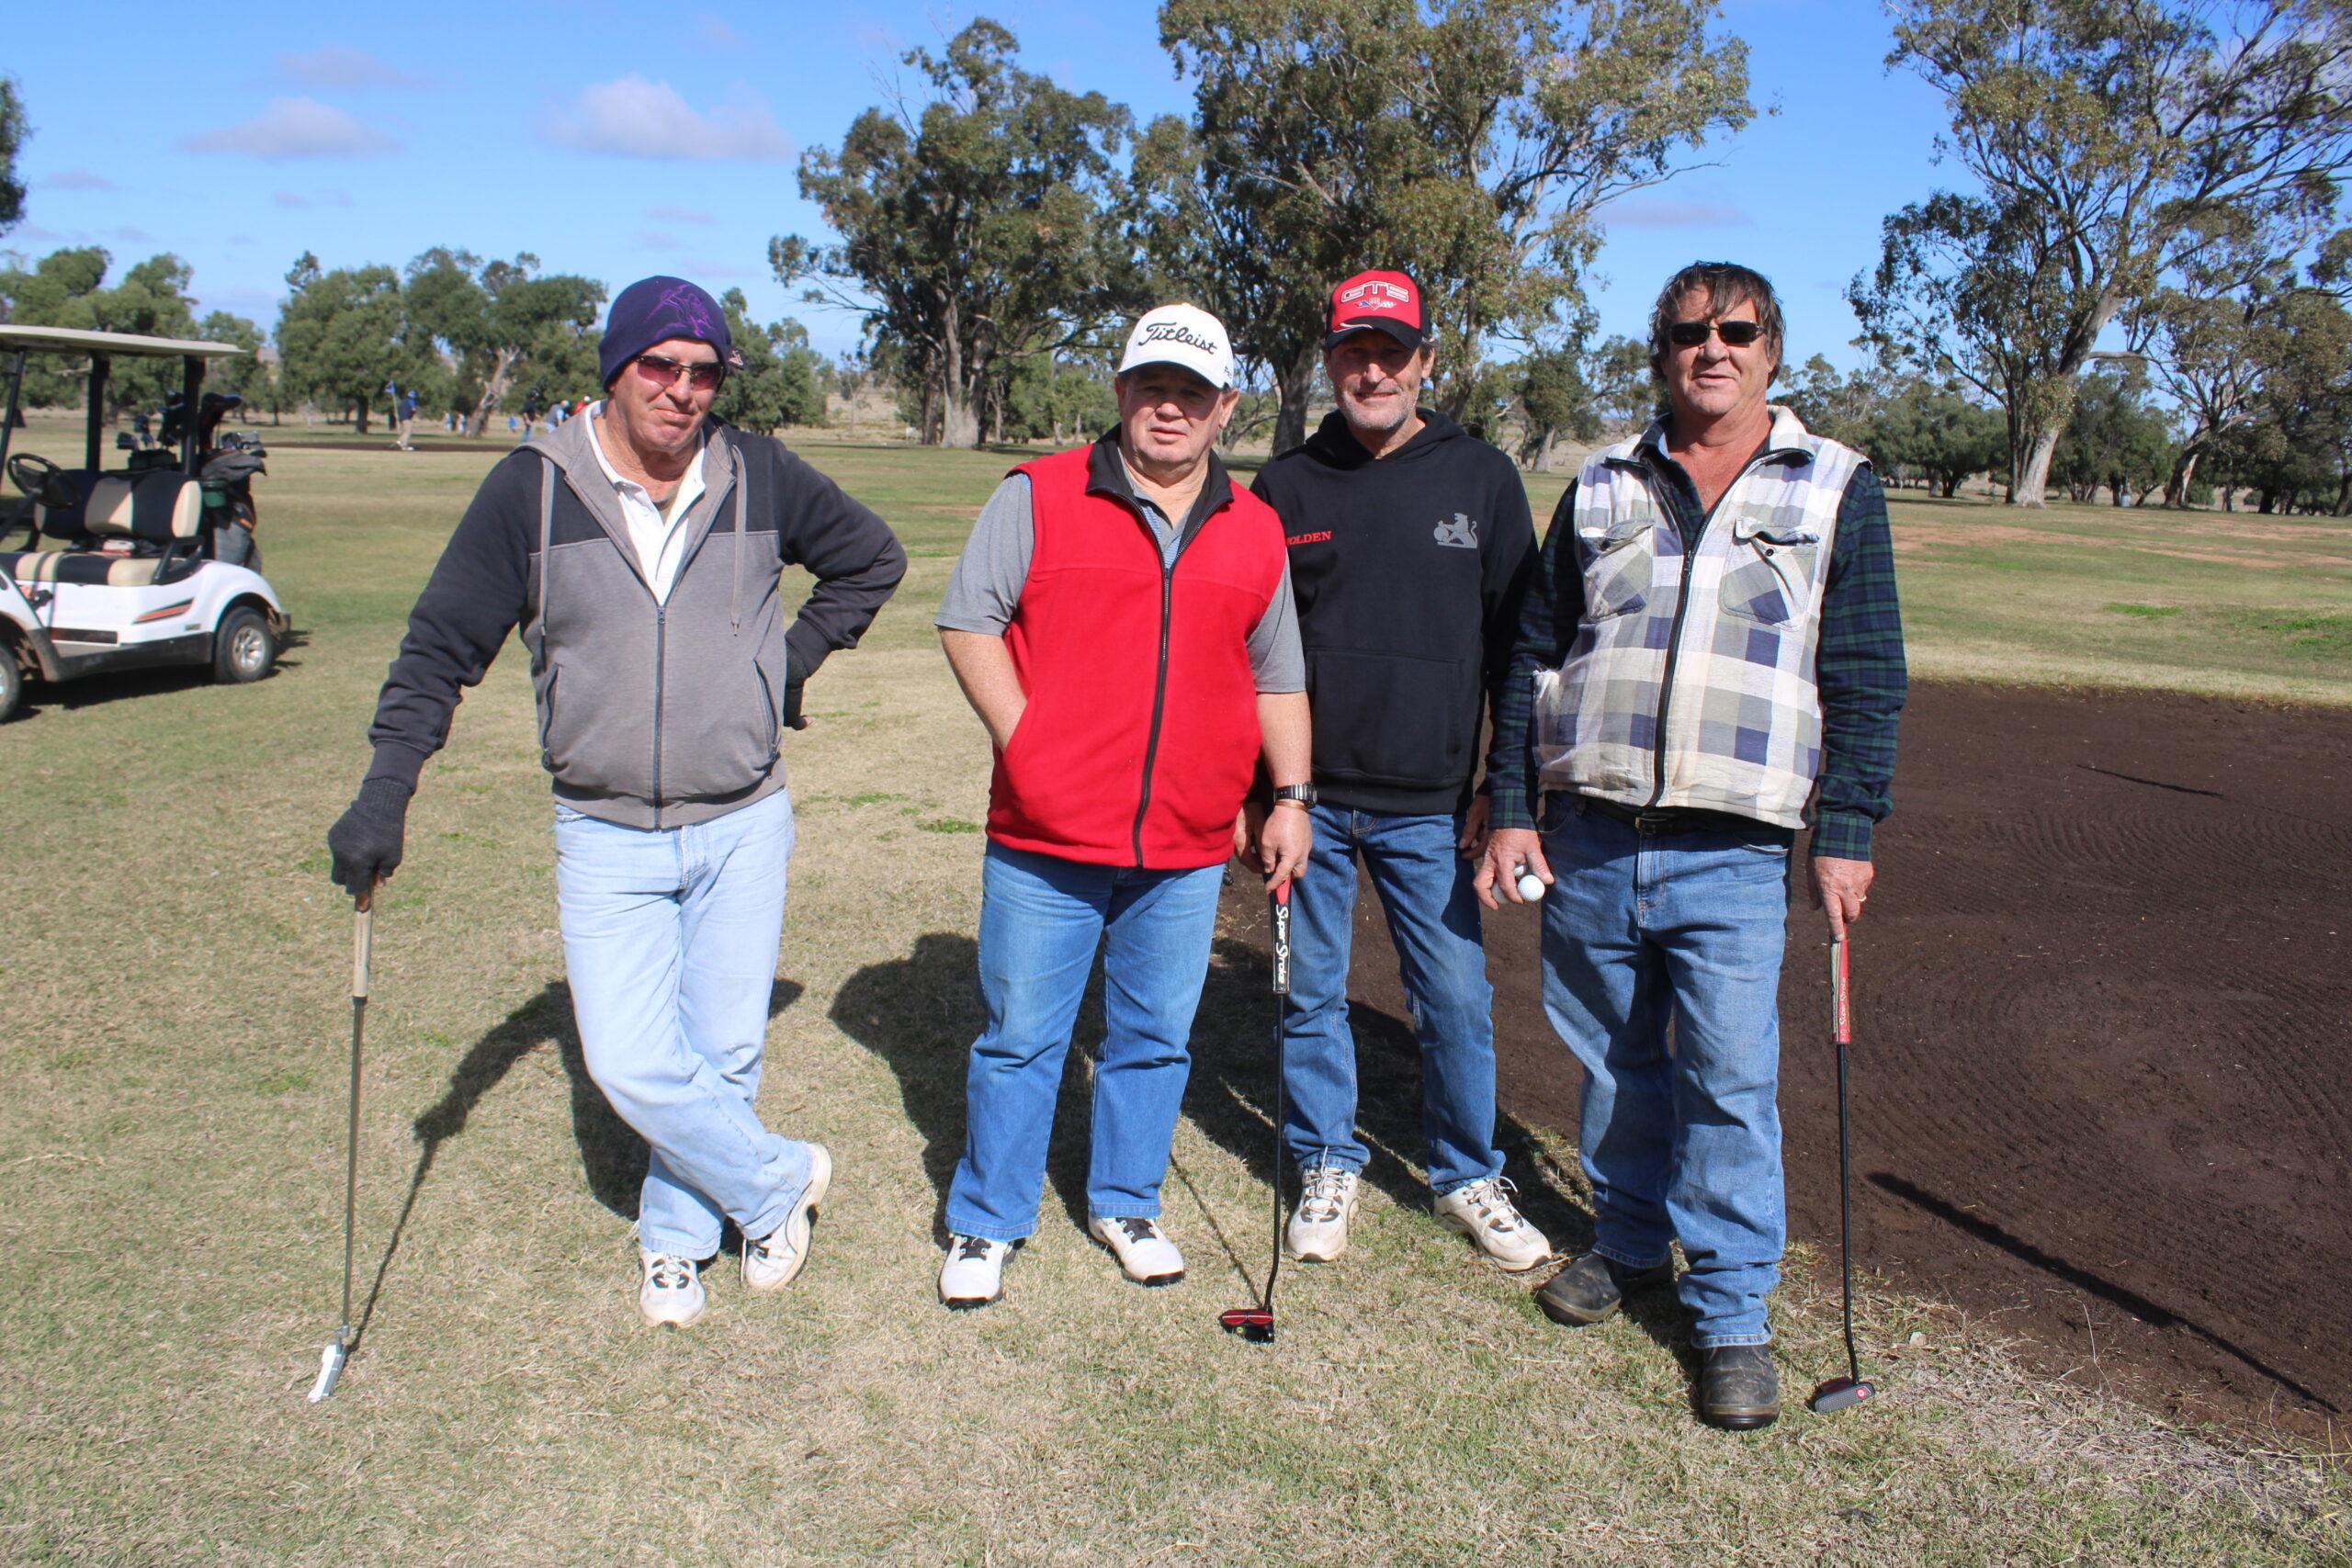 Paul Miller, Richard Miller, Tim Simmonds and Andrew Stieger.